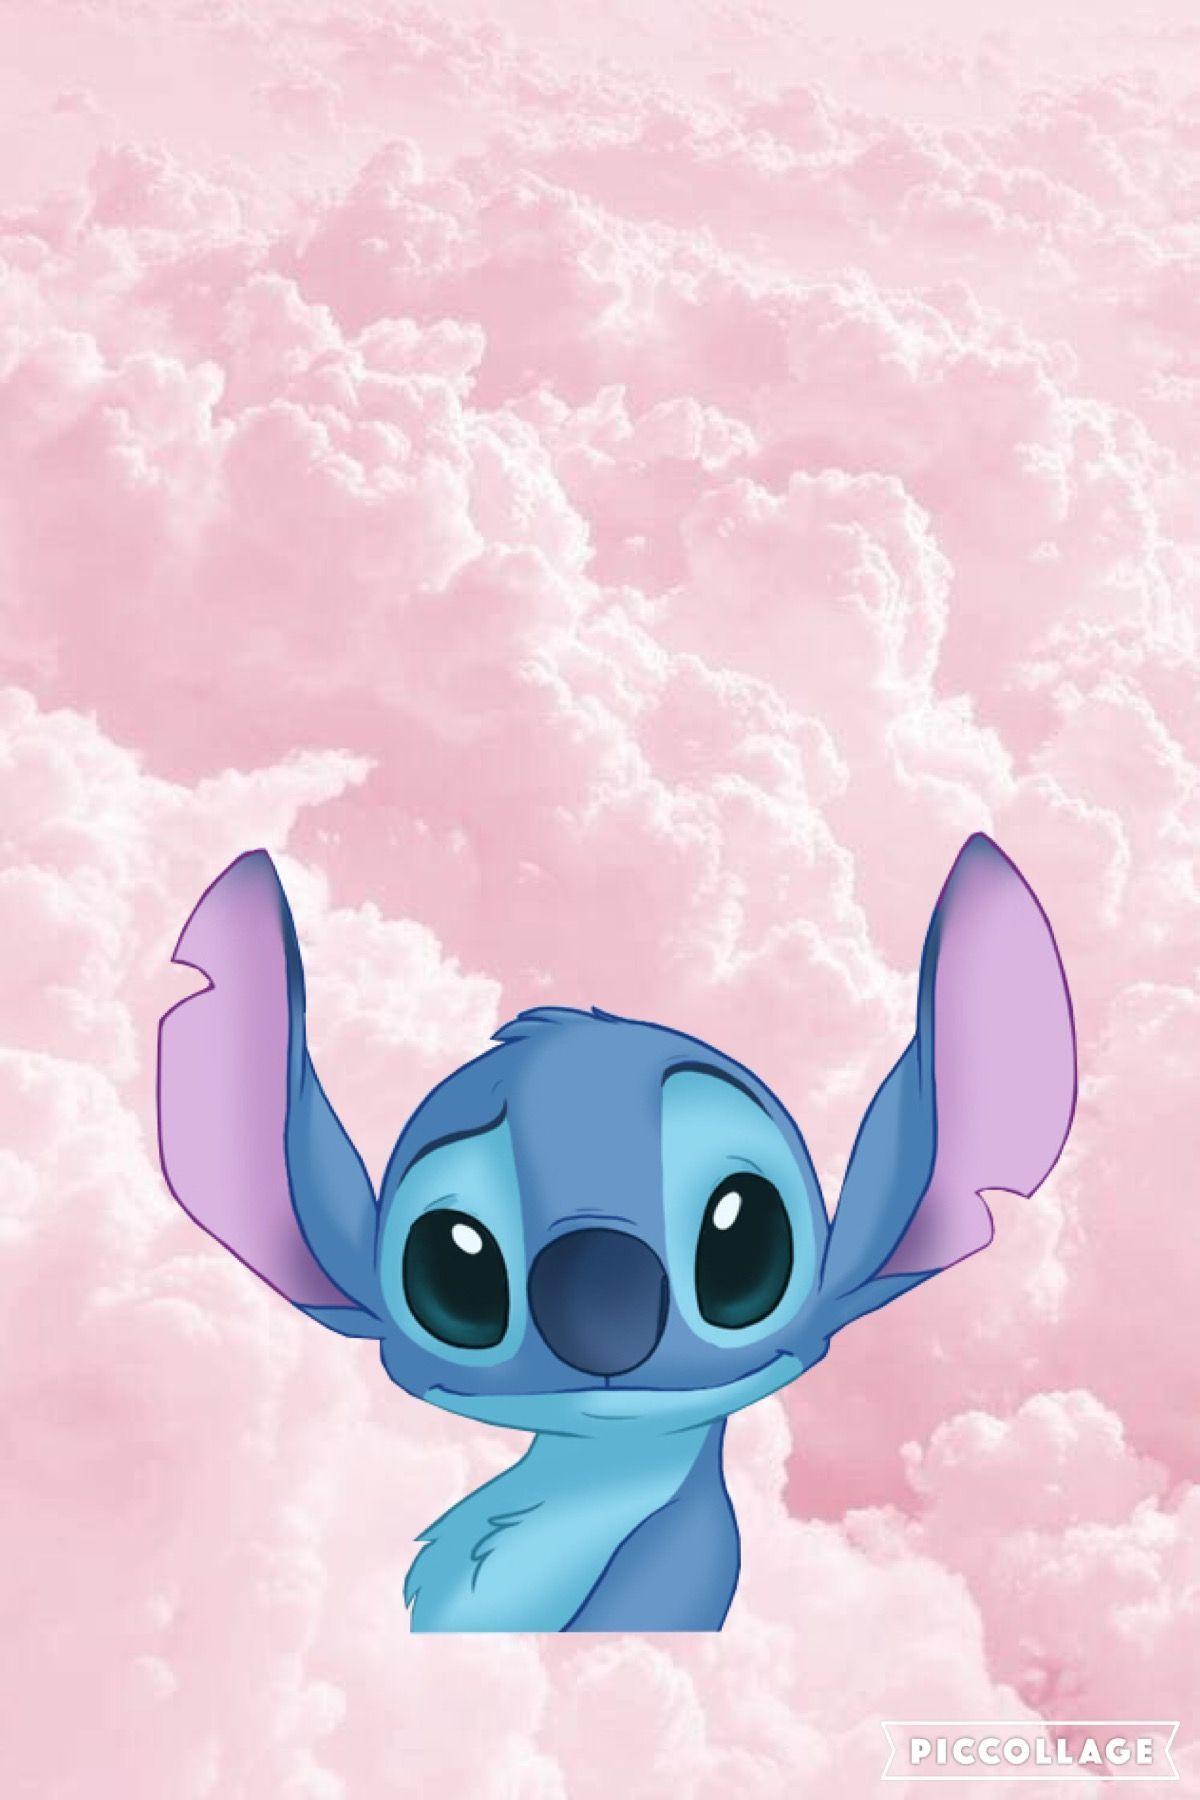 Stichhhhhhh Stichhhhhhh Stitchingwalpaper Cute Cartoon Wallpapers Cartoon Wallpaper Iphone Disney Wallpaper